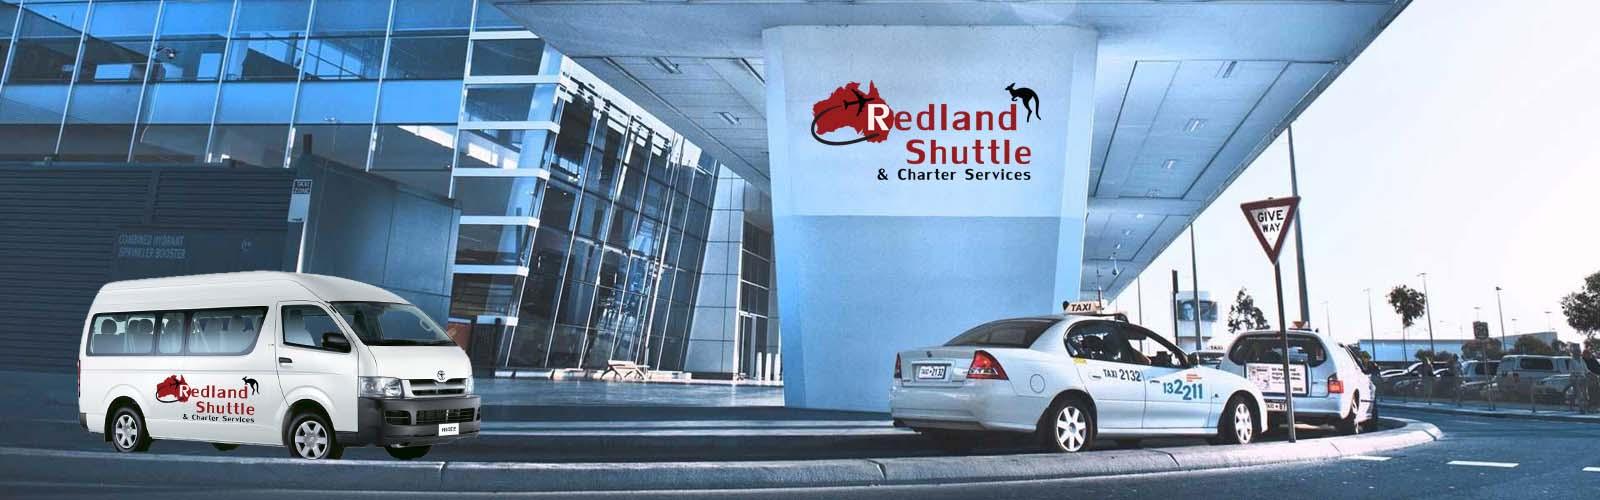 Airport Shuttle service Sydney